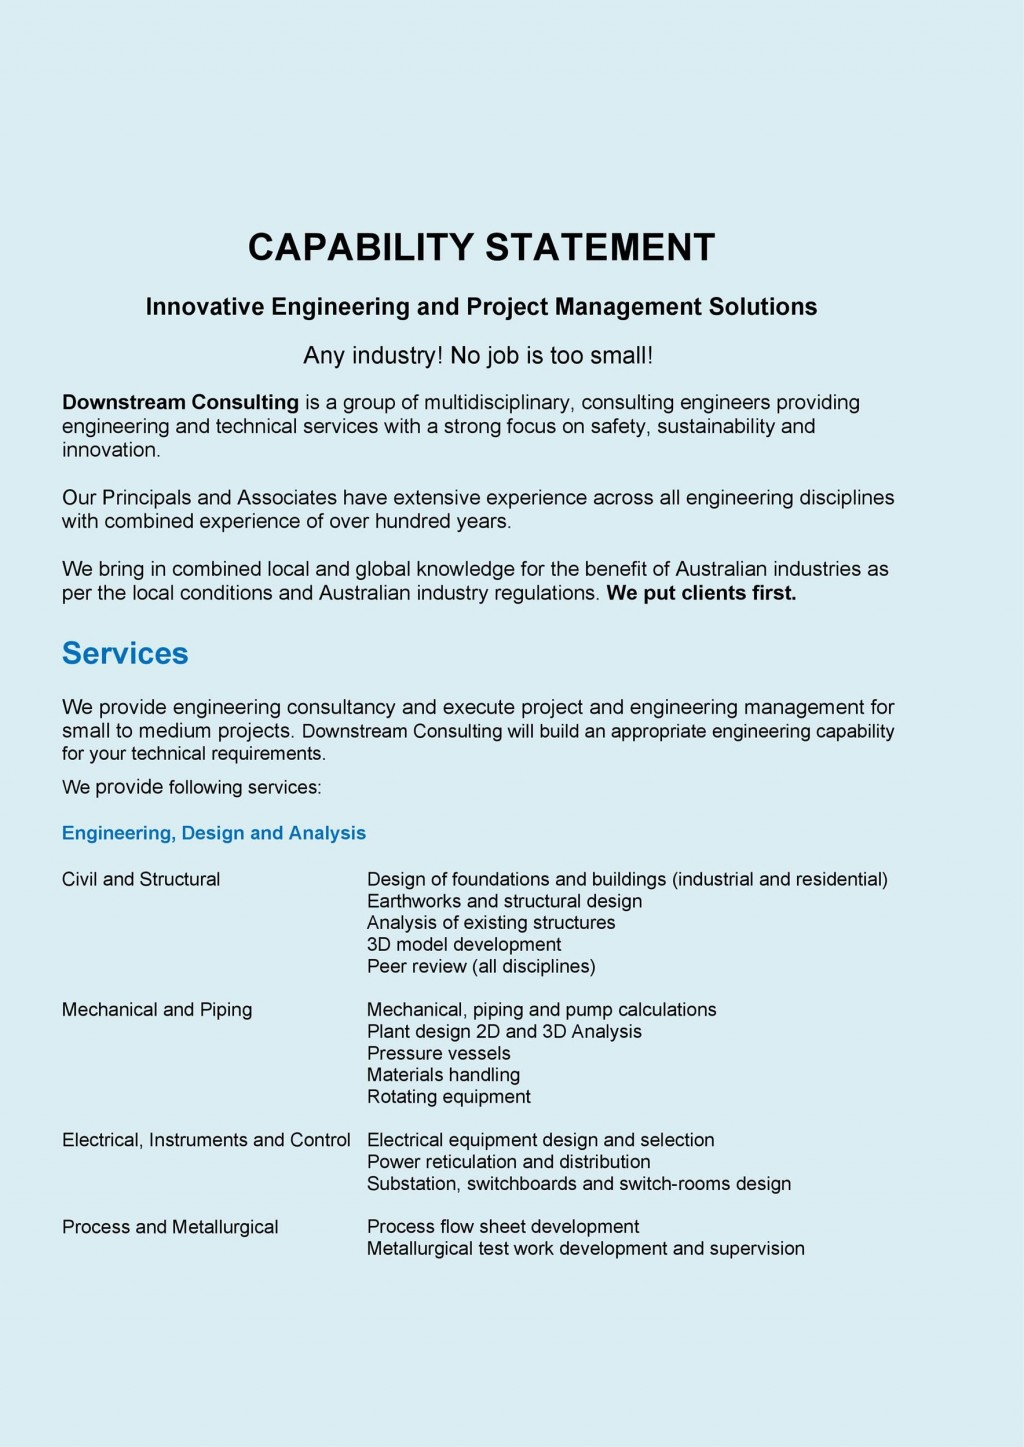 005 Rare Capability Statement Template Free Highest Quality  Word Editable DesignLarge